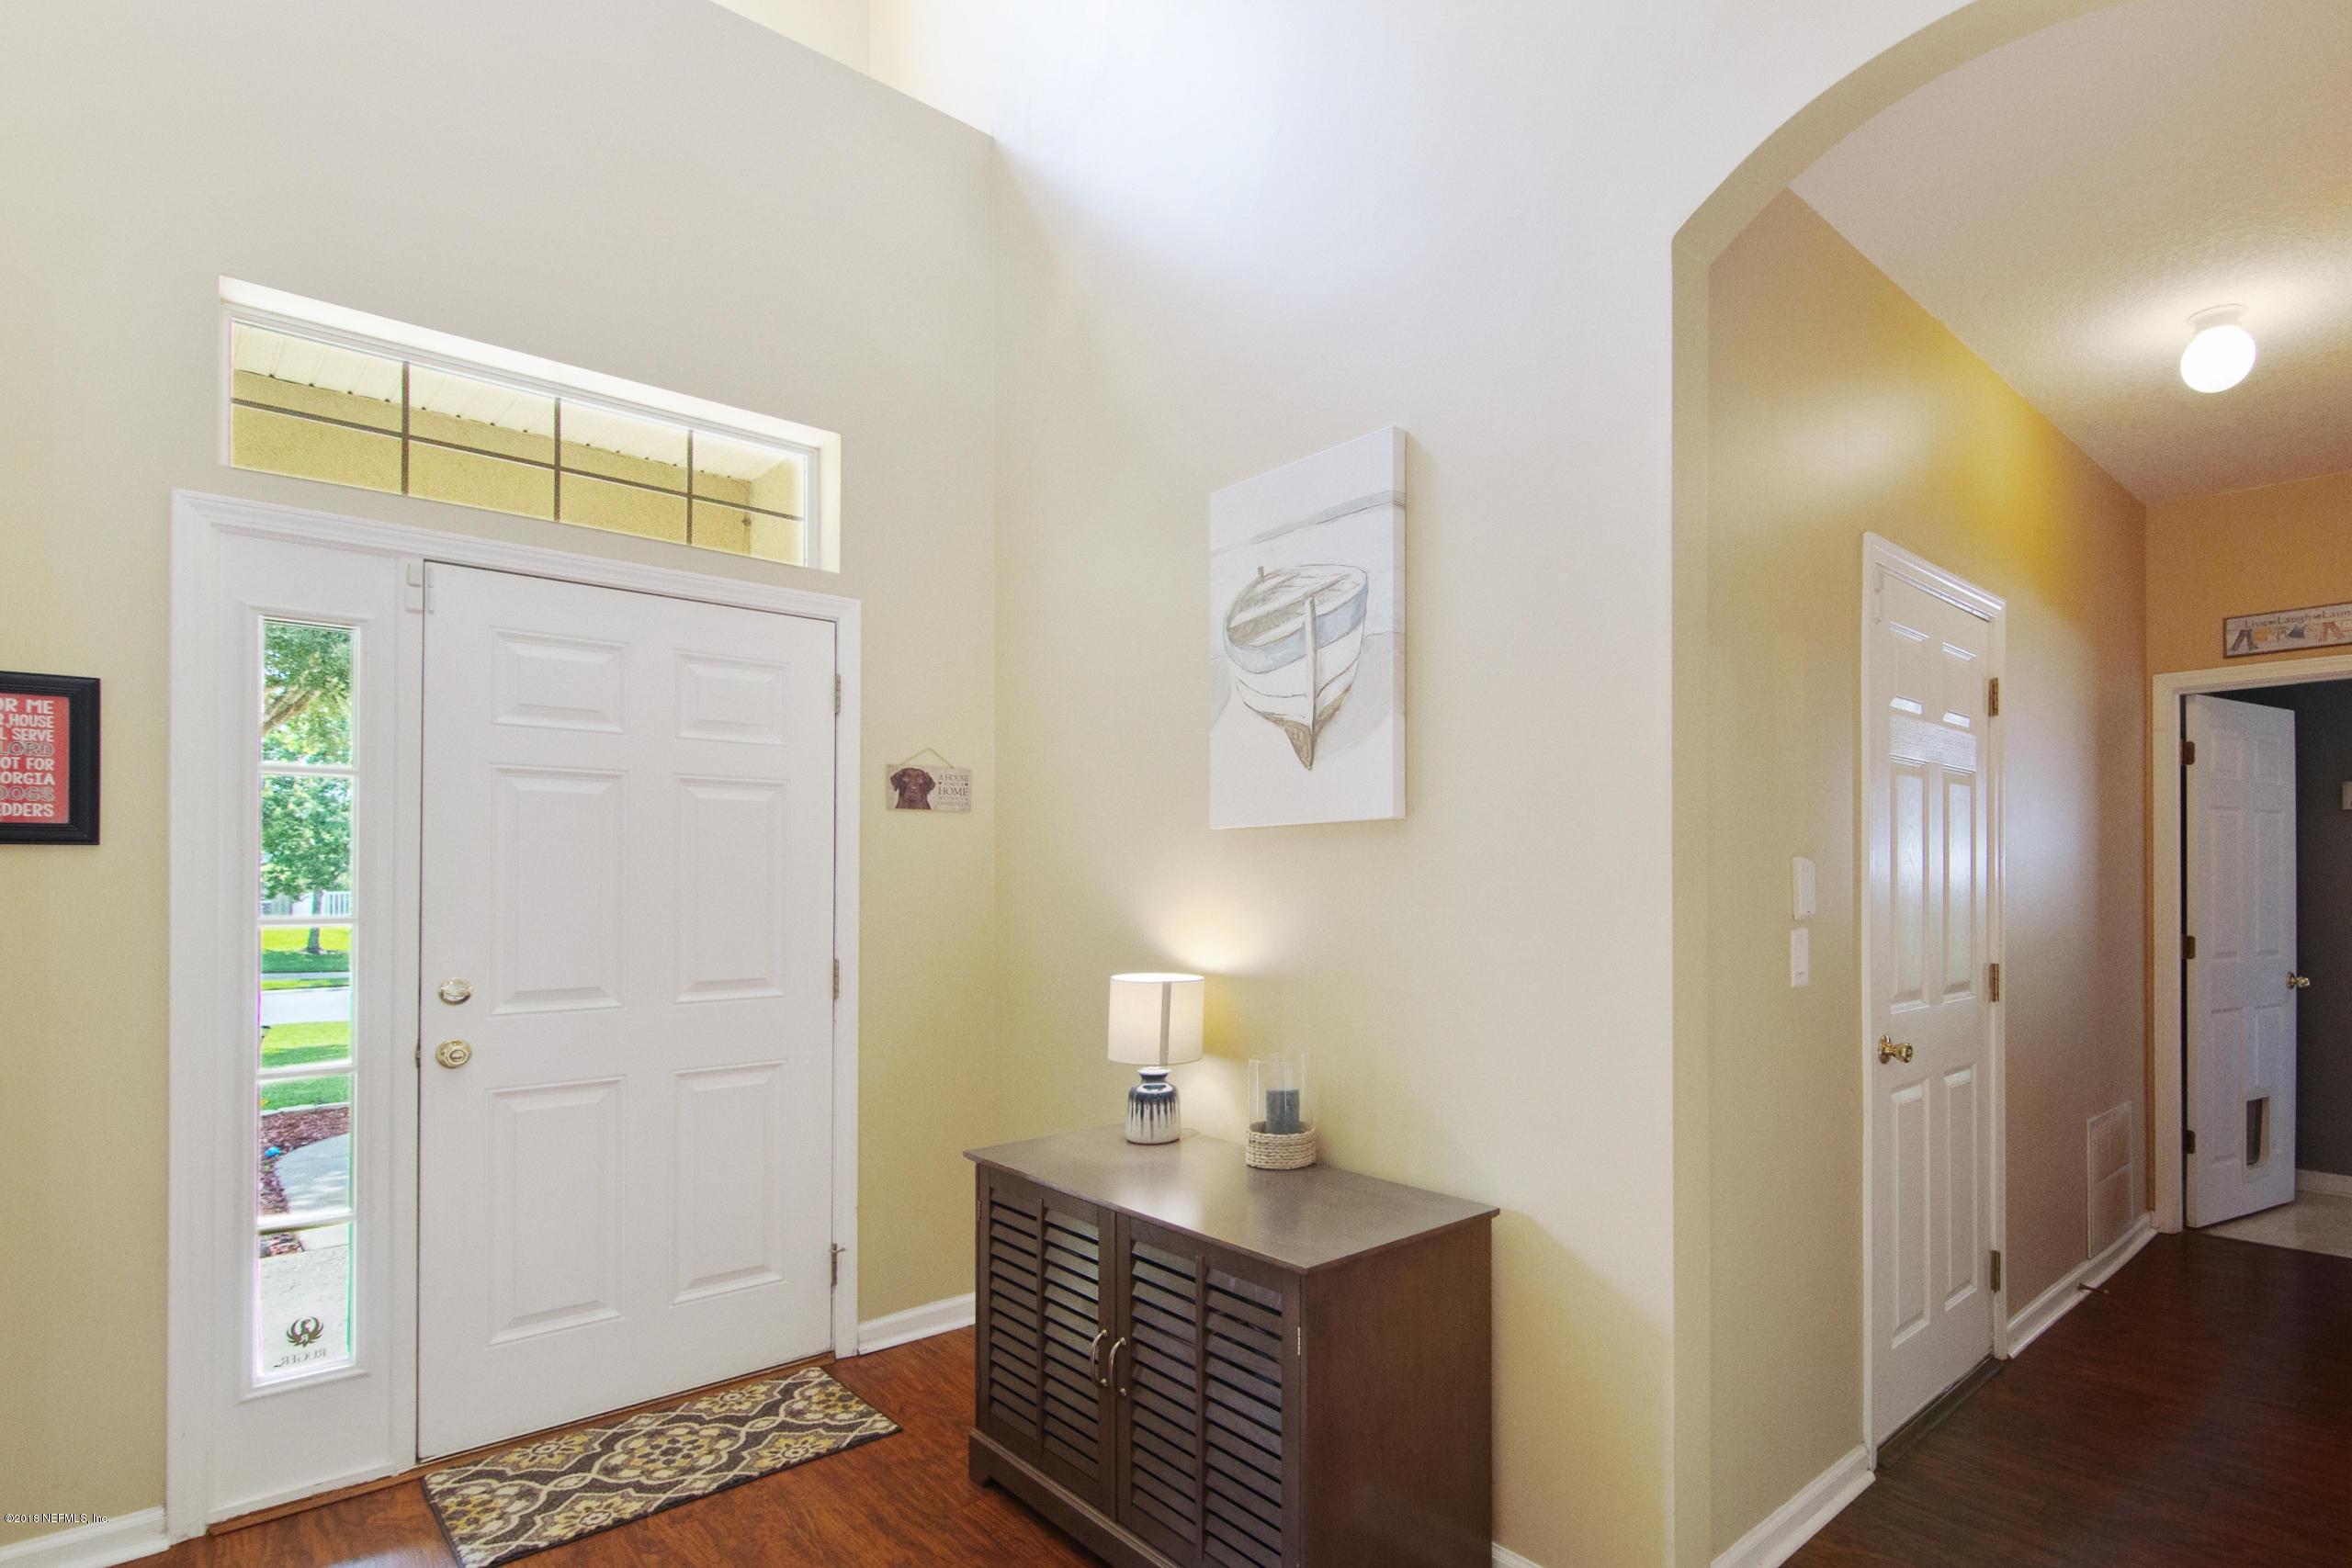 615 TREE GARDEN, ST AUGUSTINE, FLORIDA 32086, 4 Bedrooms Bedrooms, ,2 BathroomsBathrooms,Residential - single family,For sale,TREE GARDEN,948335